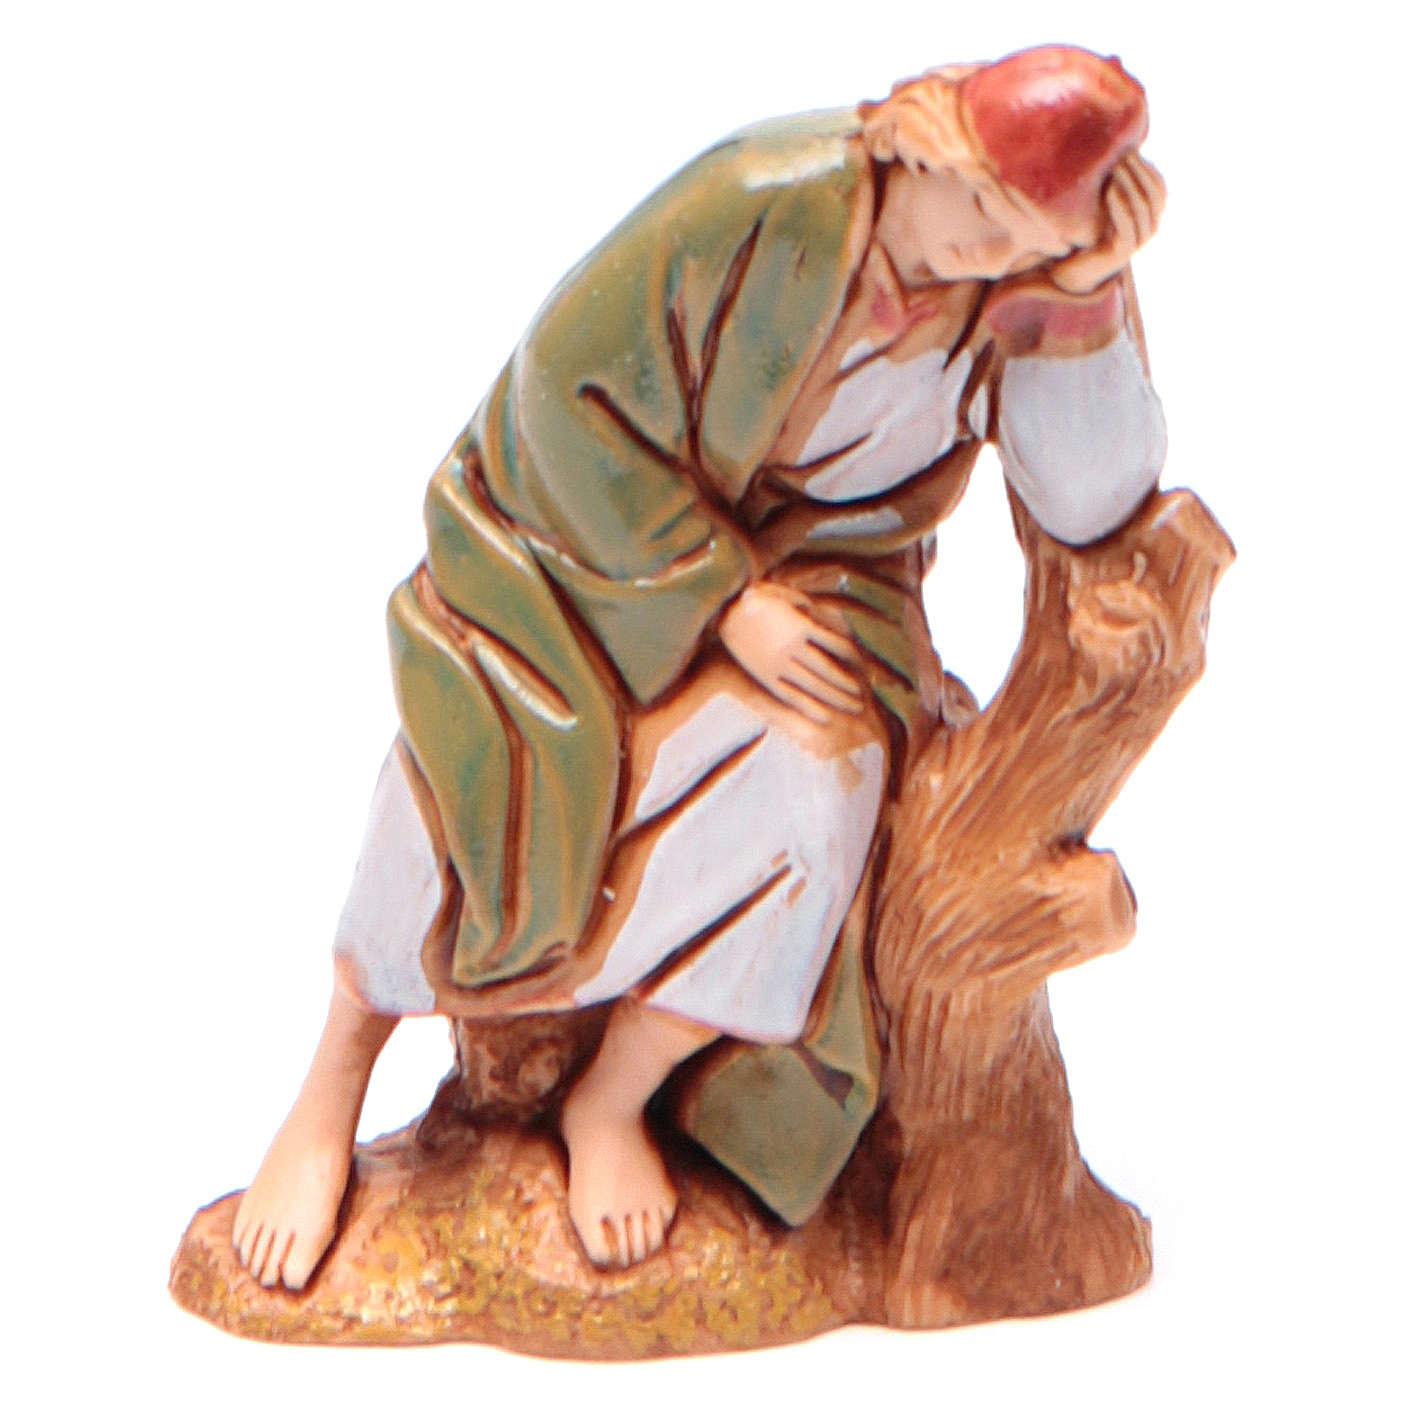 Sleeping shepherd 6.5cm by Moranduzzo, Arabian style 4